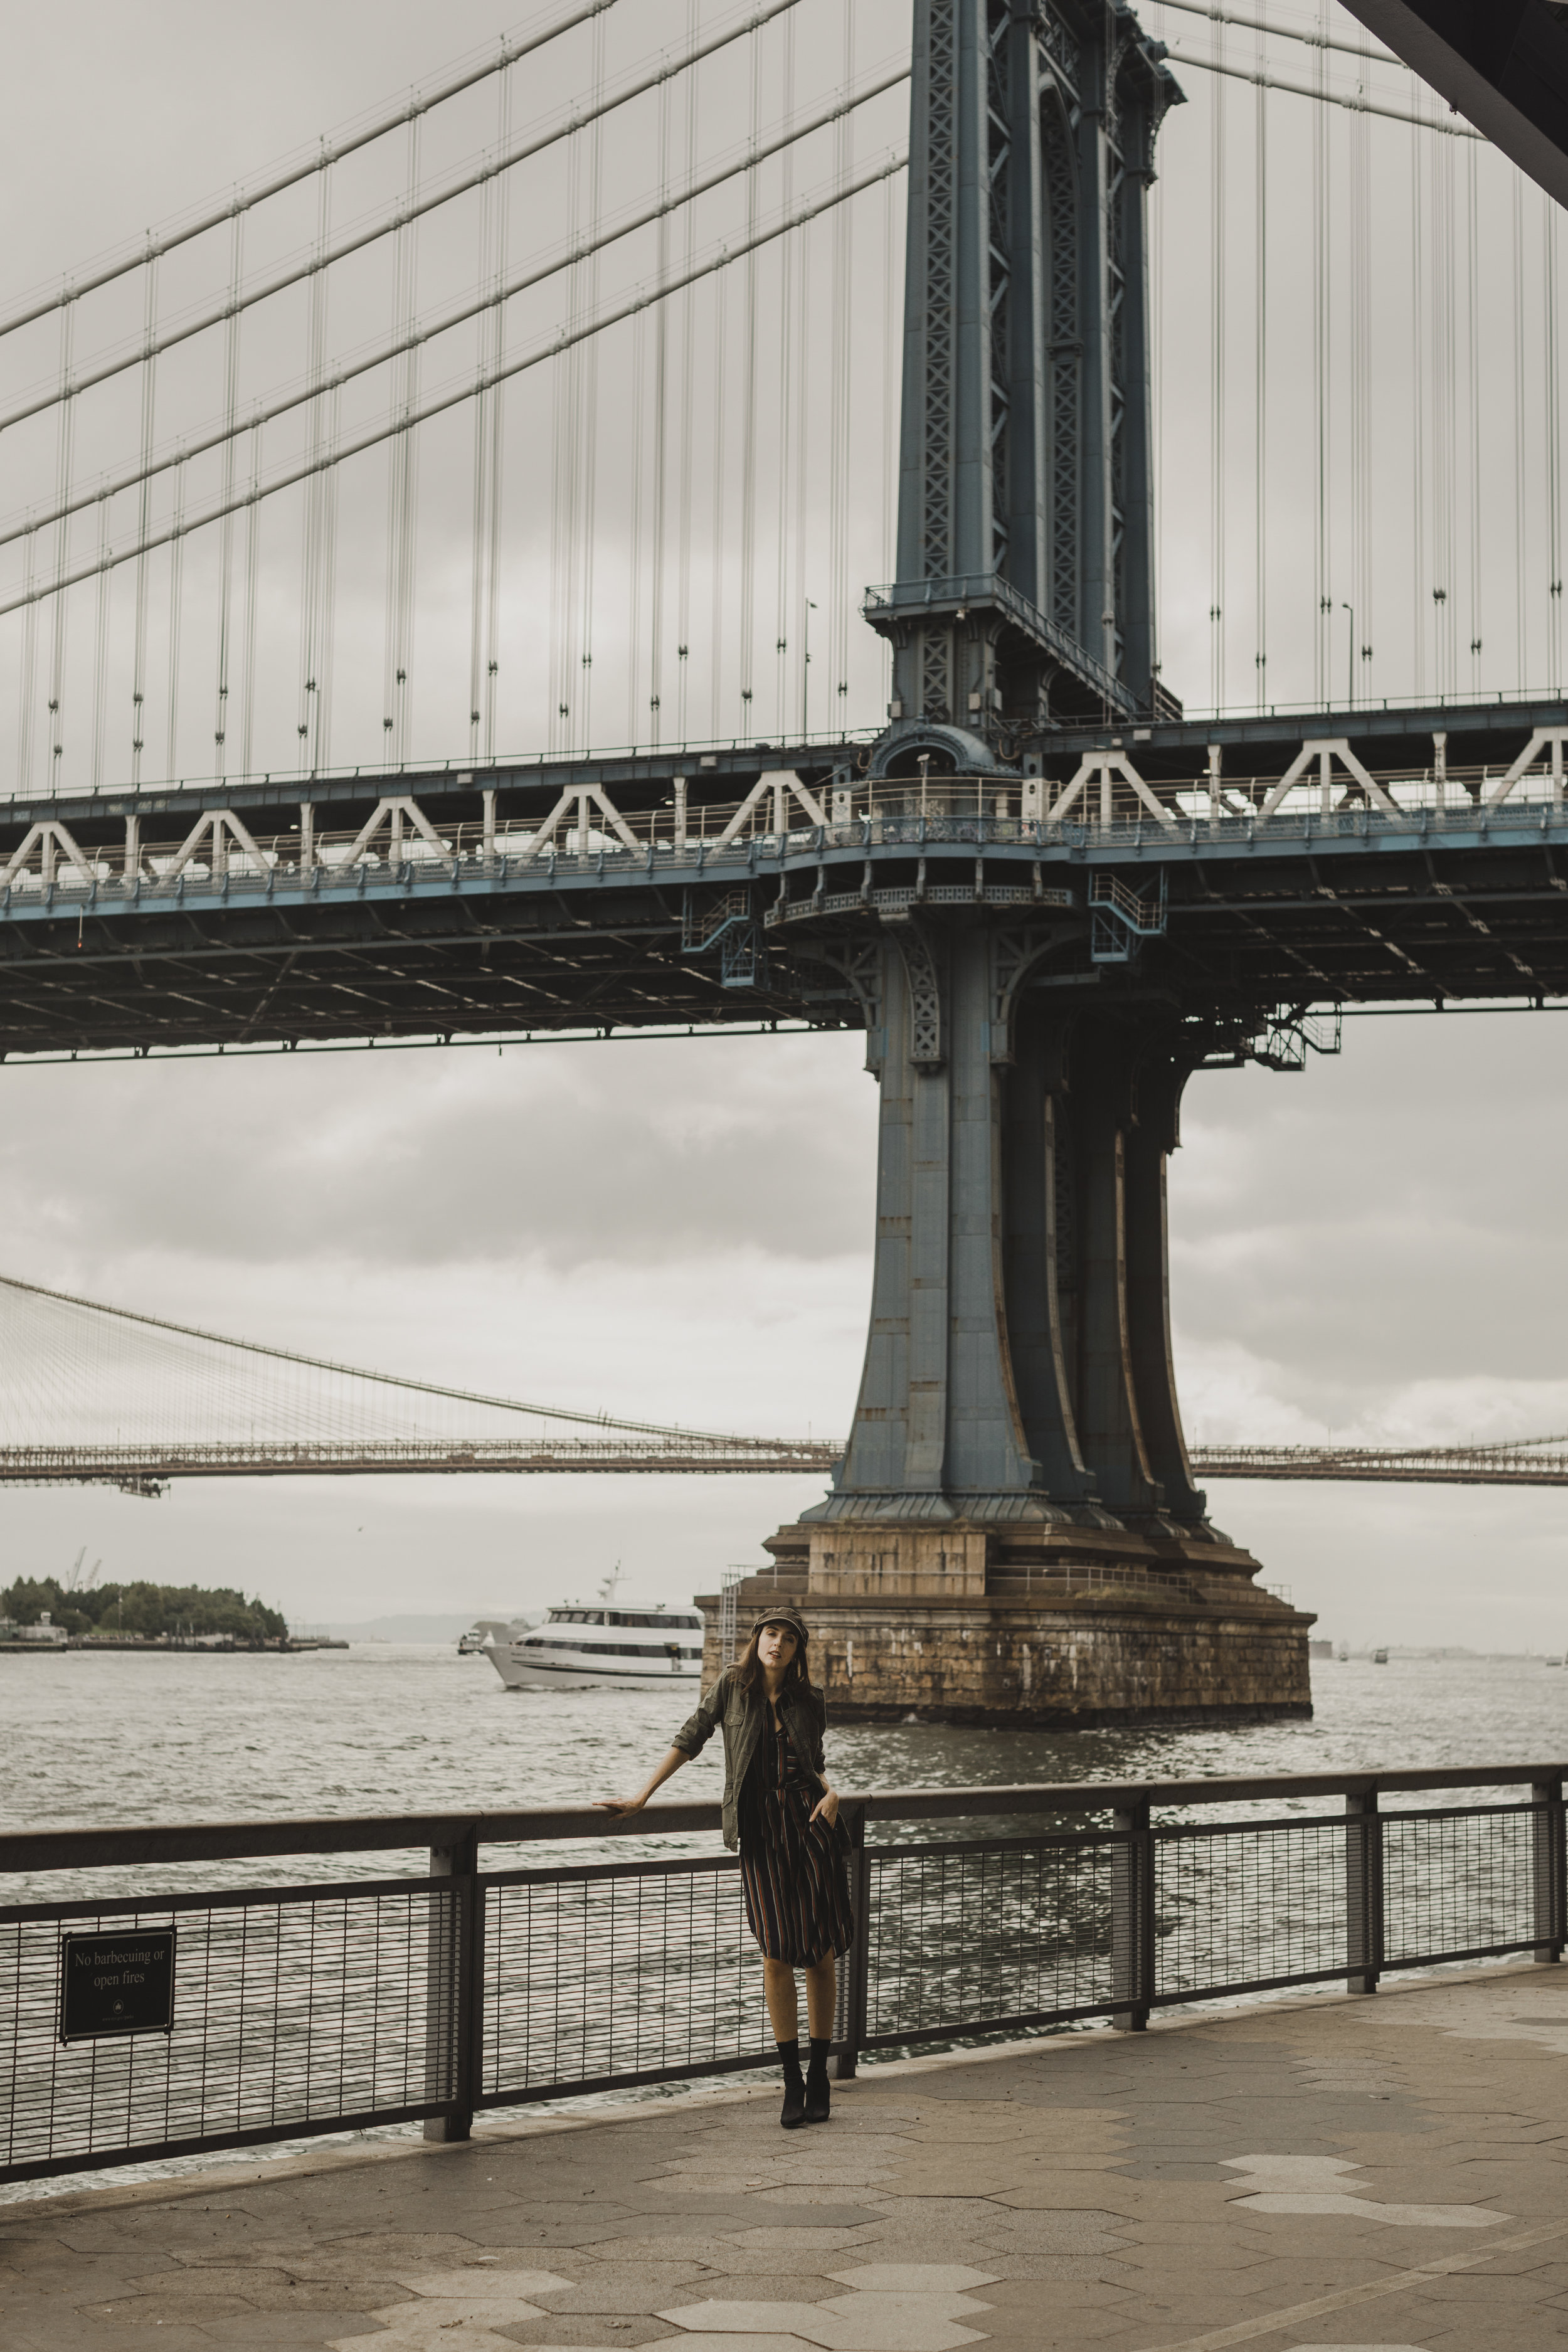 ALIX_NYC_ANTHRO_03.jpg